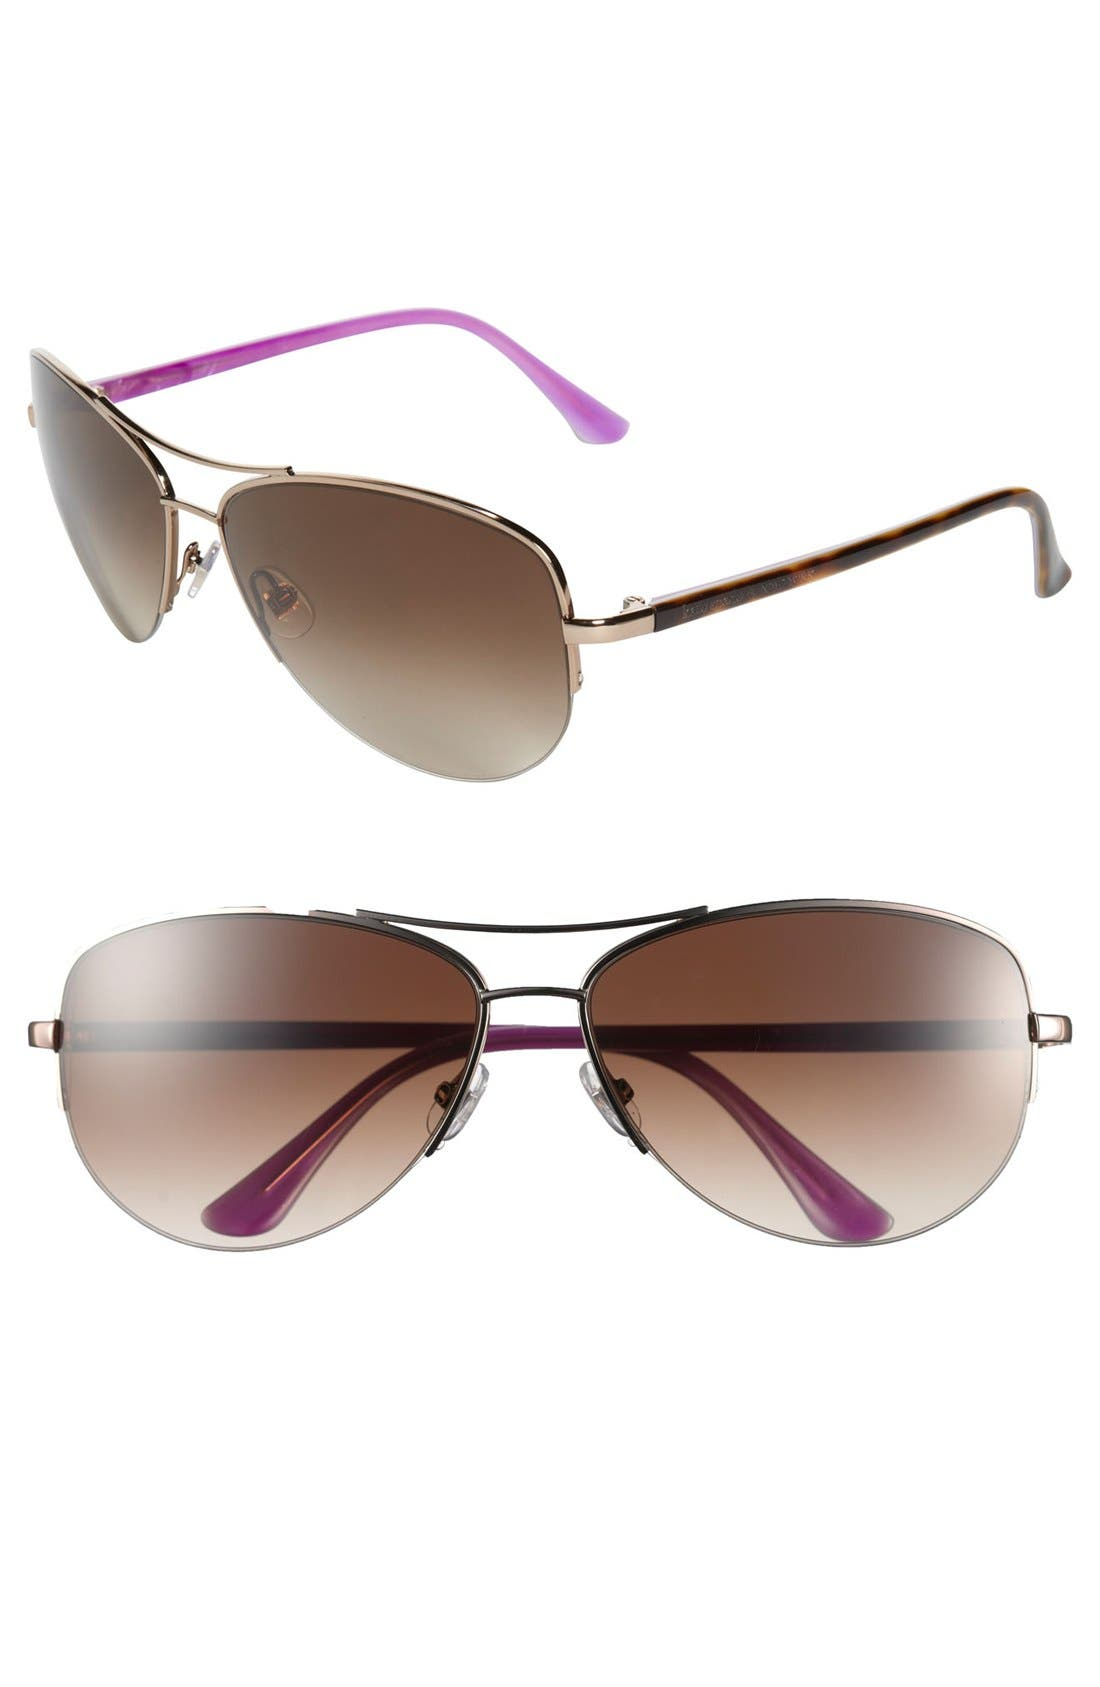 Alternate Image 1 Selected - kate spade new york 'elysia' 61mm rimless aviator sunglasses